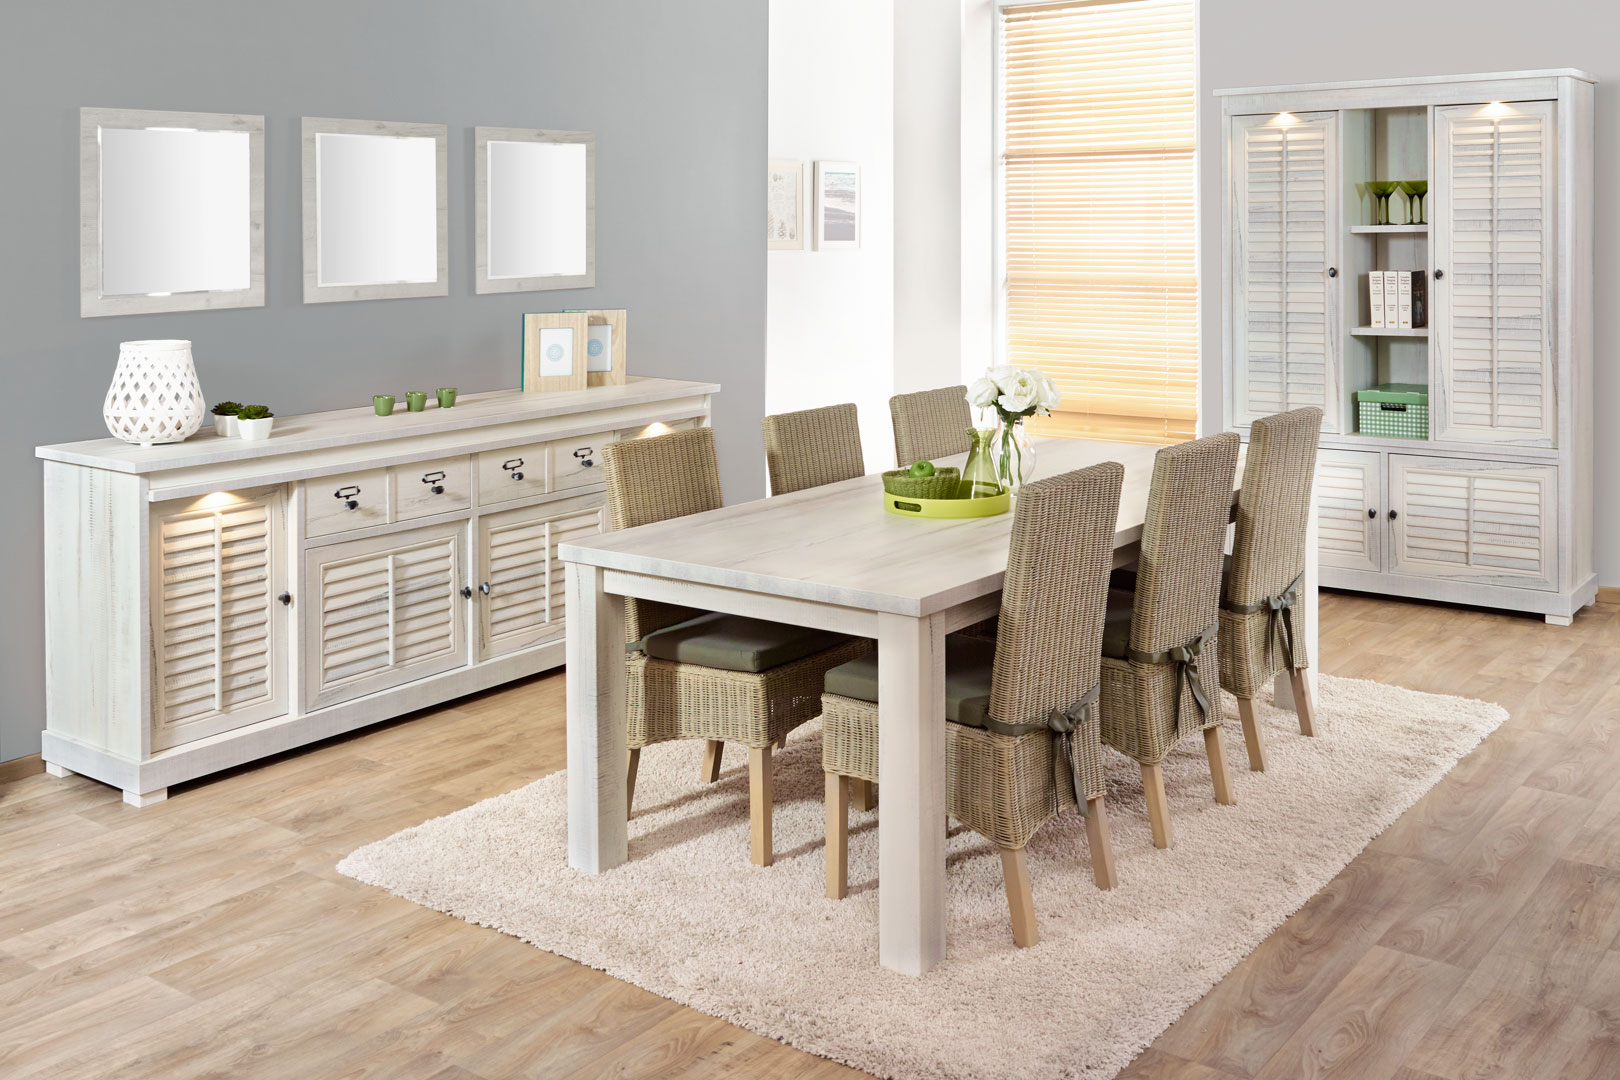 Salle à manger contemporaine chêne blanchi Daytona